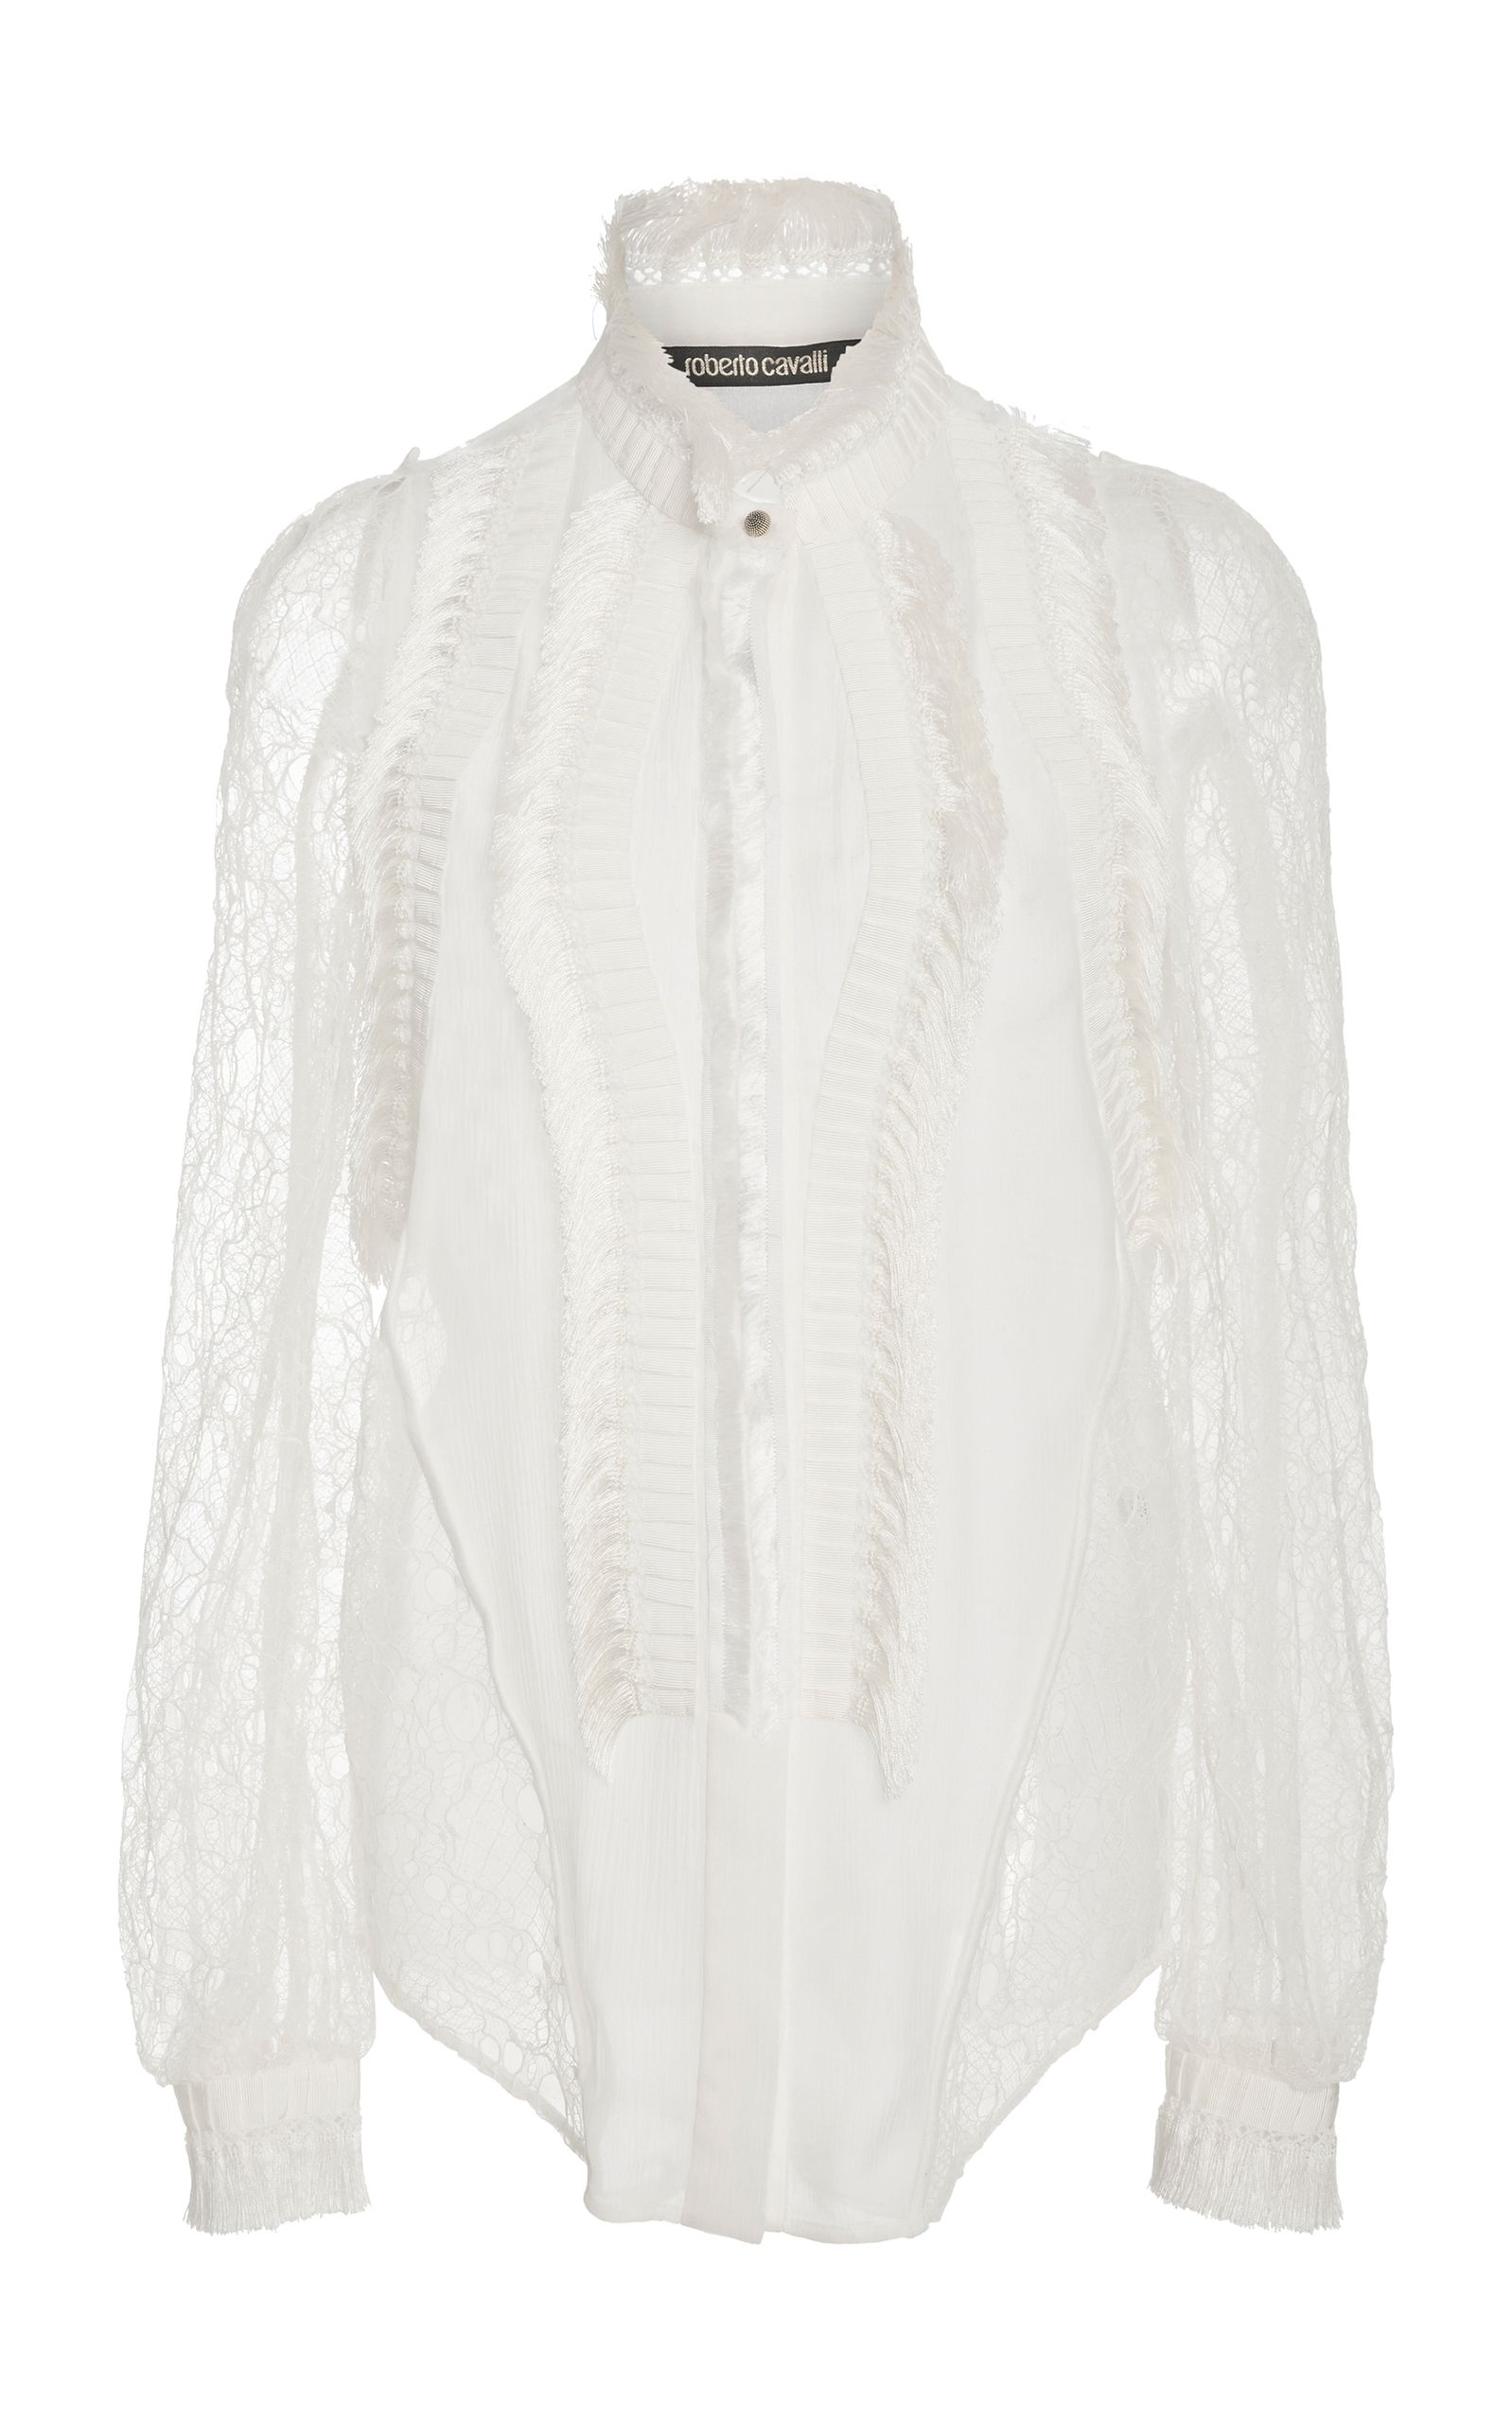 8cd0893031e2a3 Lace-Paneled Silk Blouse by ROBERTO CAVALLI Now Available on Moda Operandi